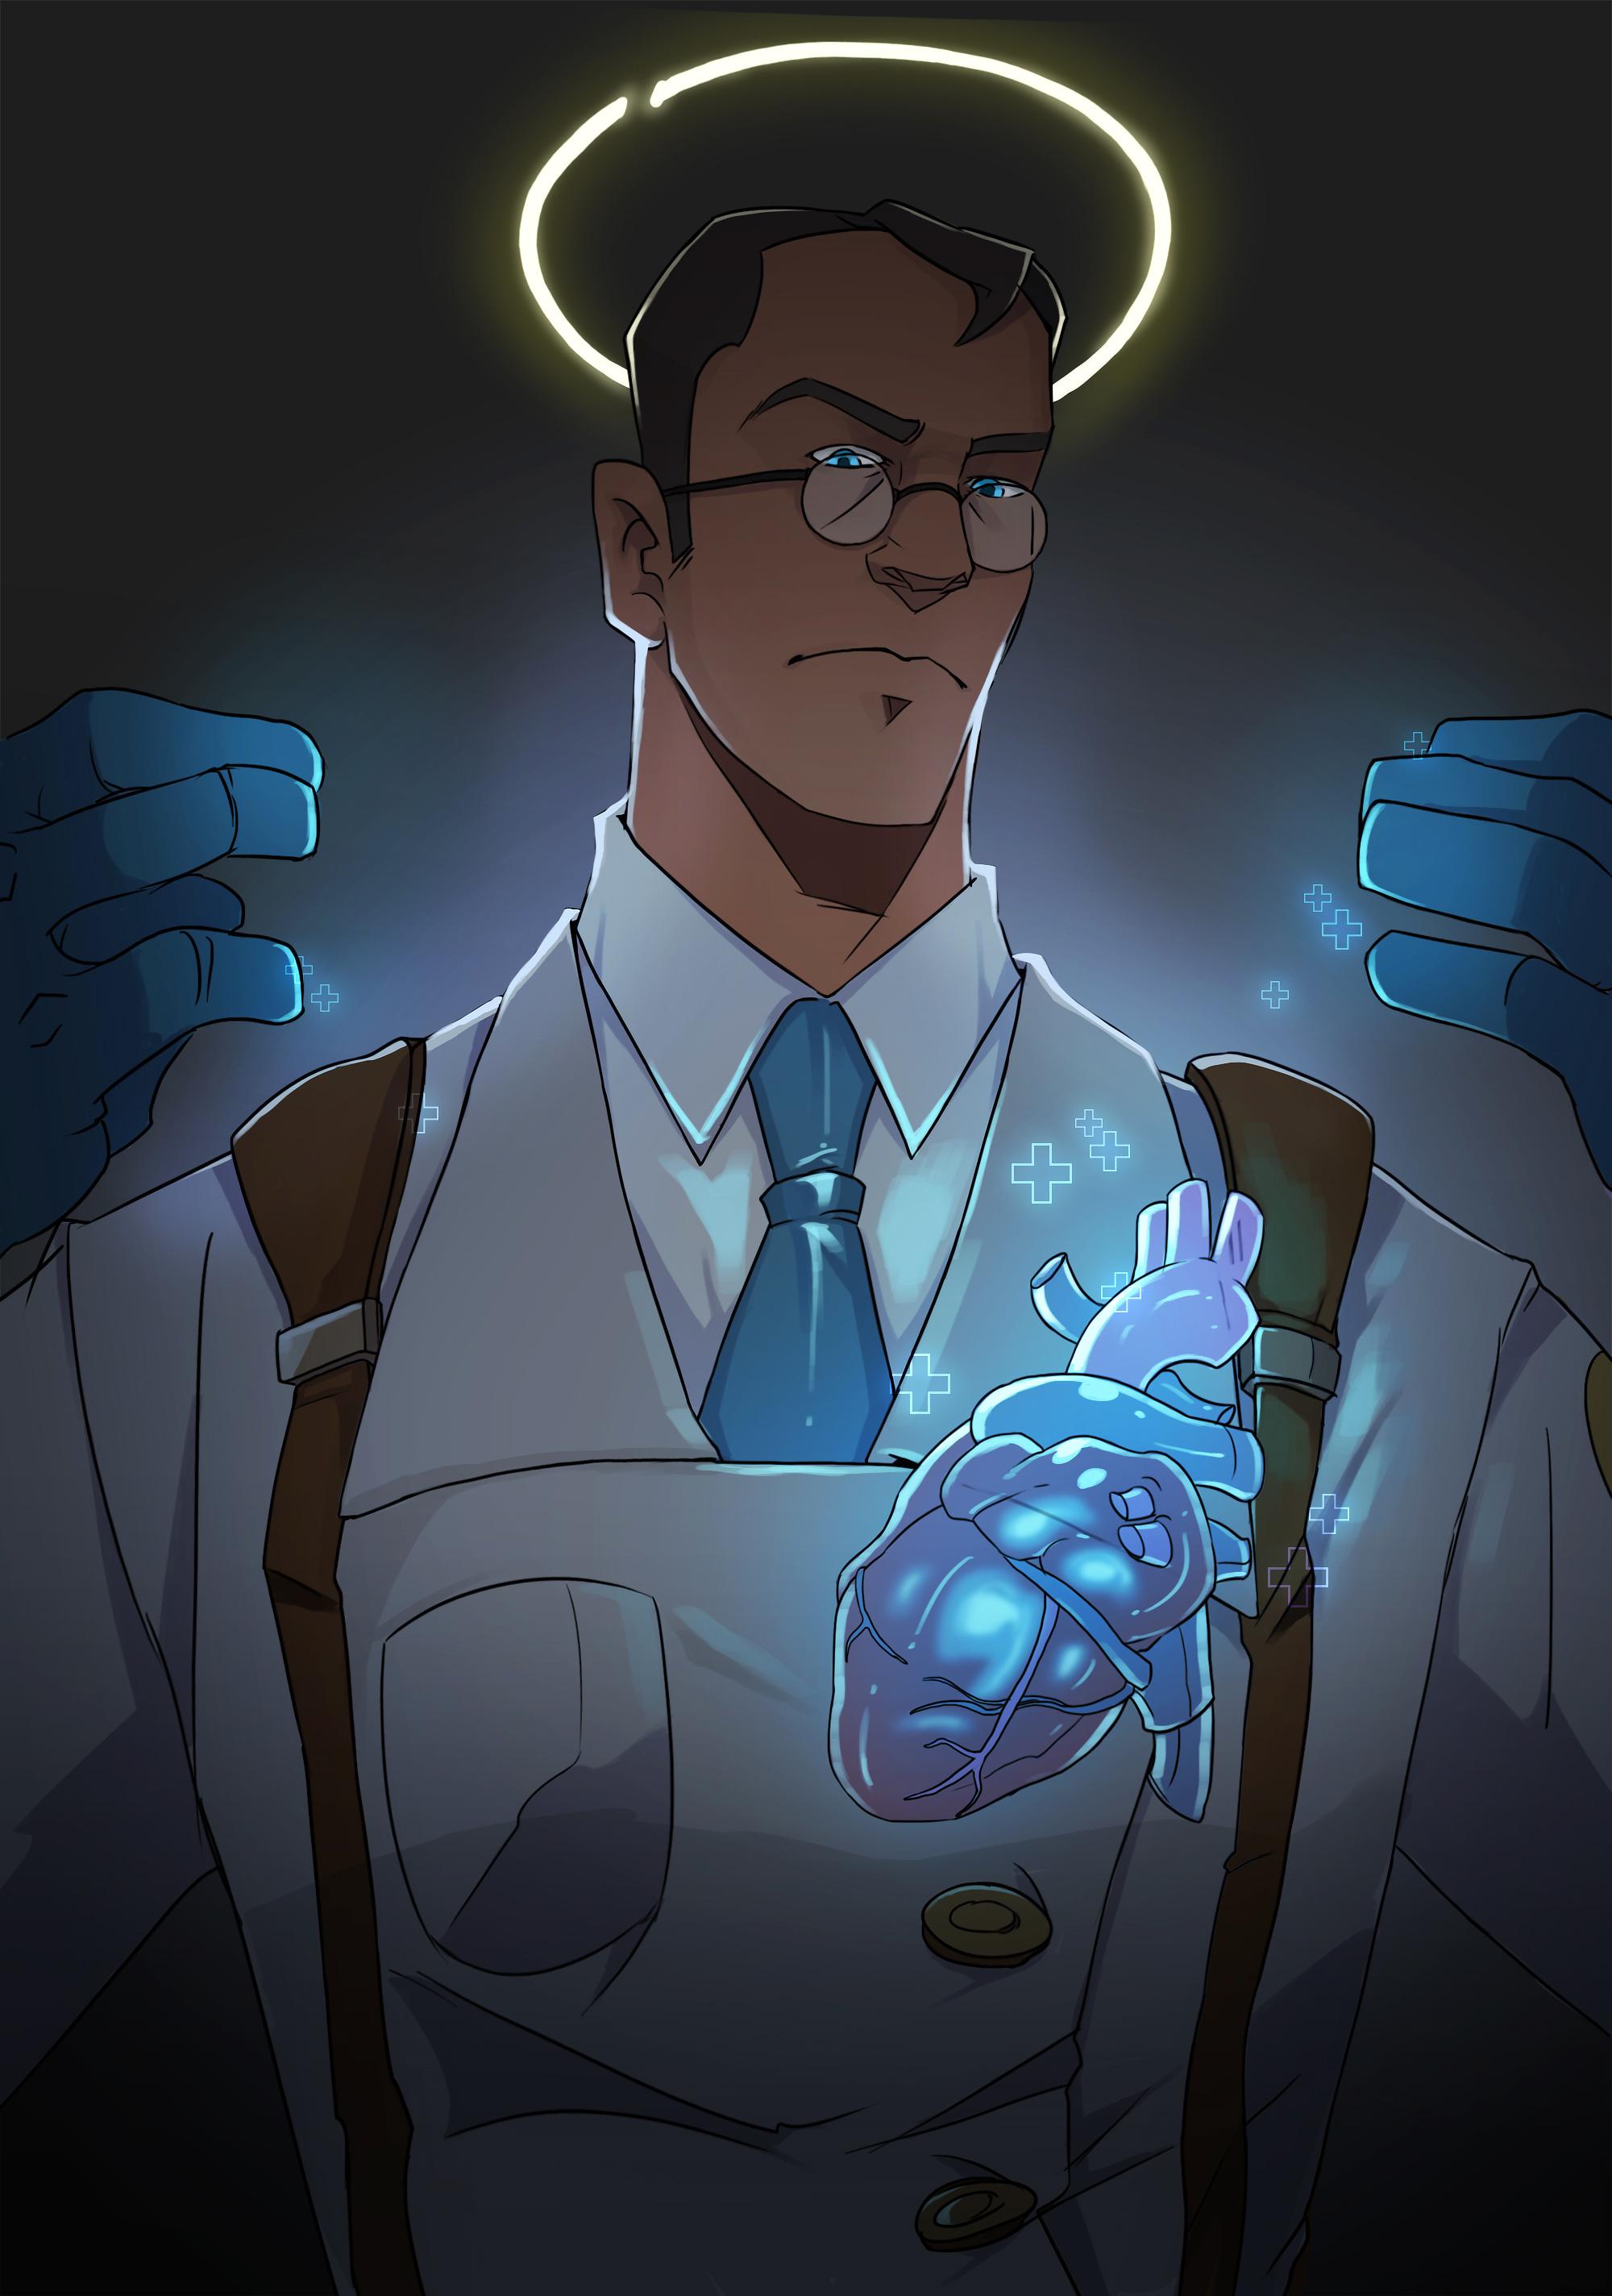 Medic by Rakihiro on DeviantArt